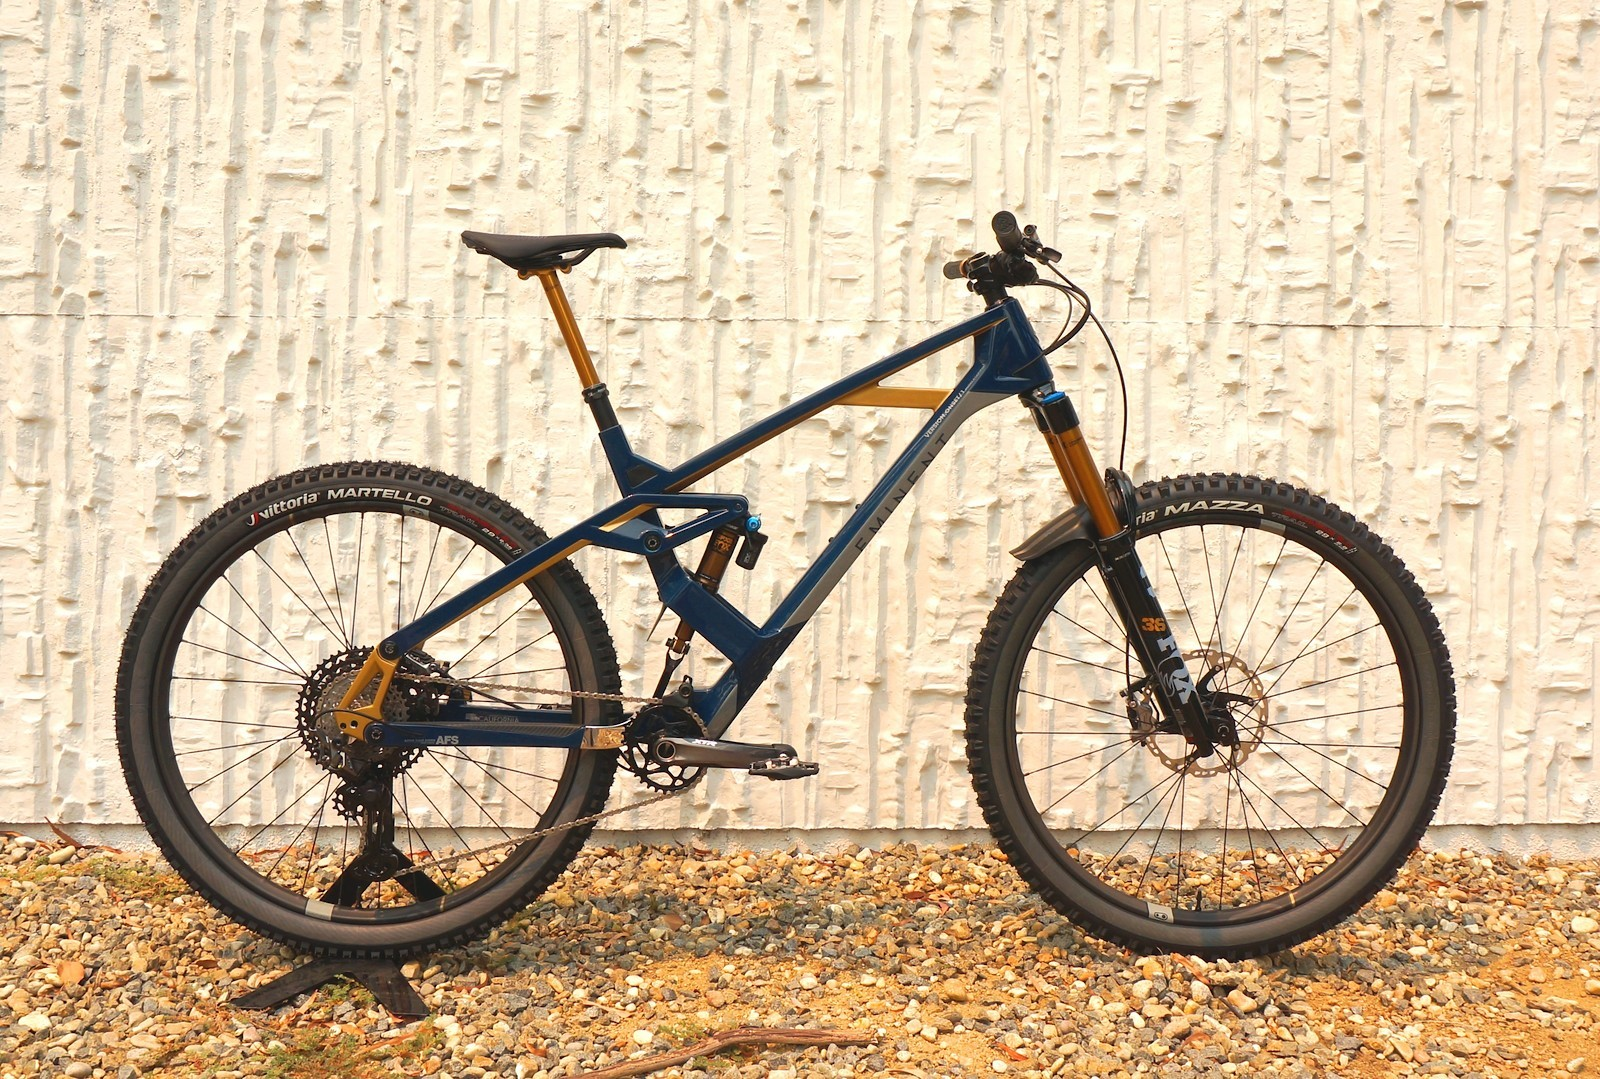 Eminent Onset MT 29 - Vital Bike of the Day September 2020 - Mountain Biking Pictures - Vital MTB